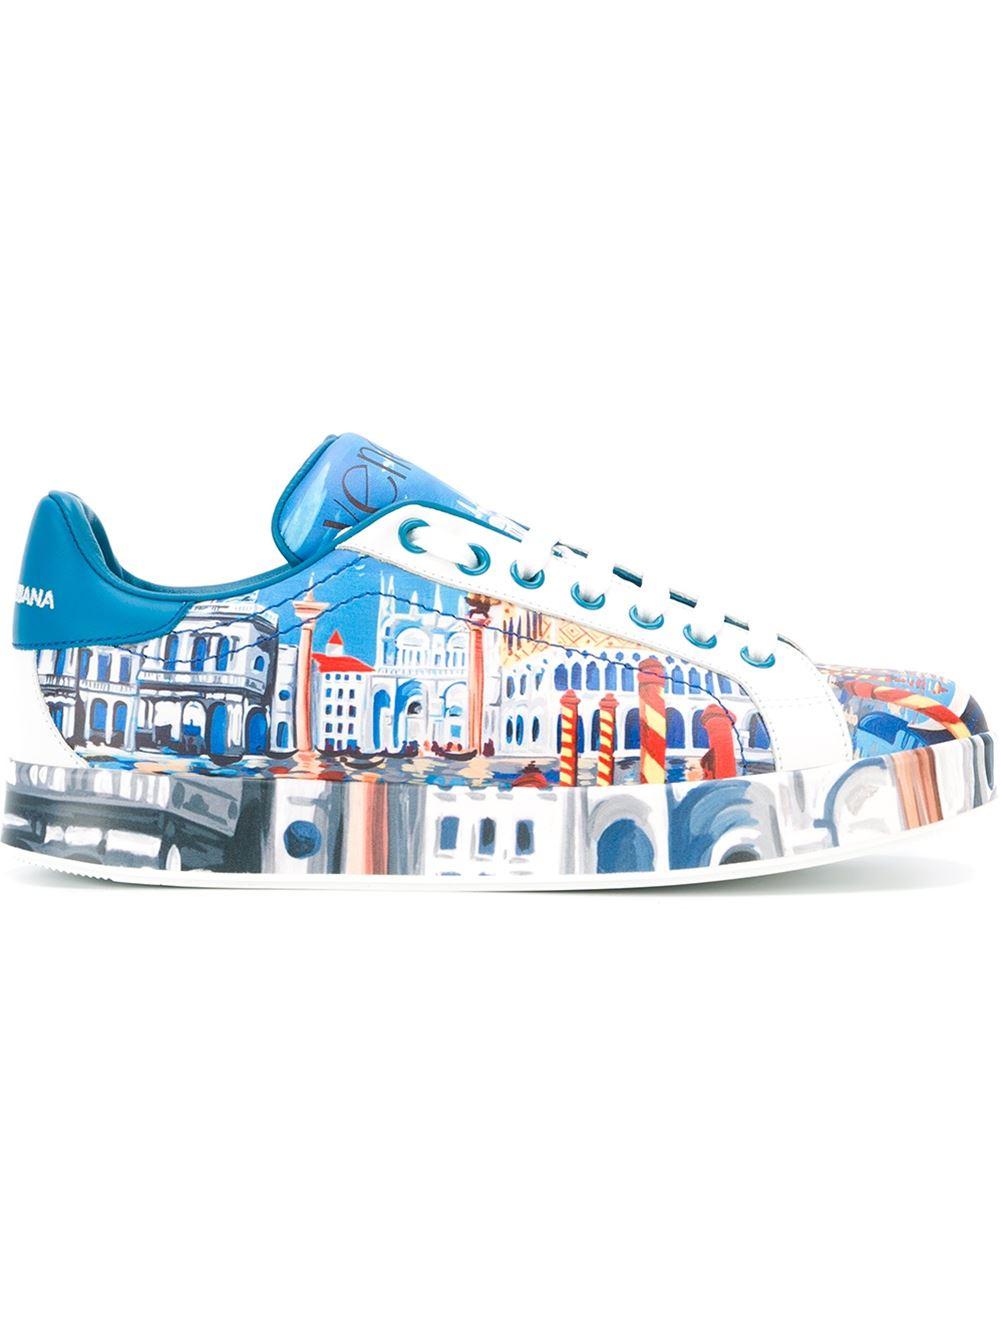 DOLCE & GABBANA Venezia print sneakers FarFetch.jpg